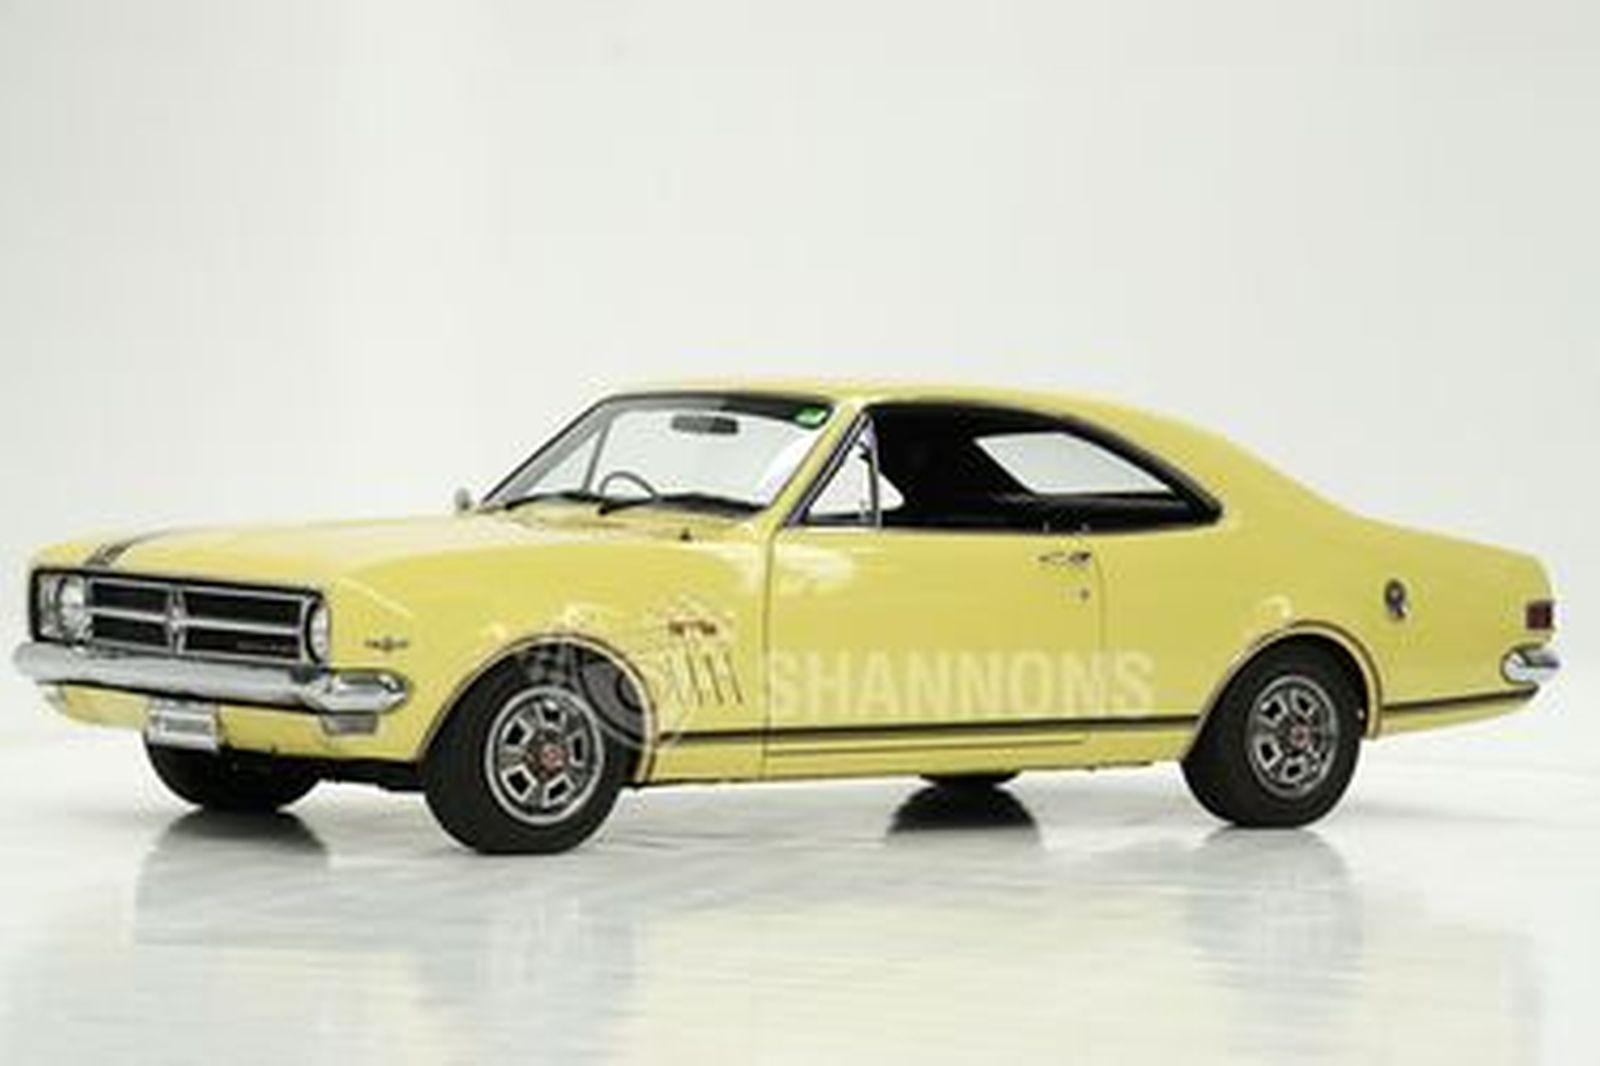 Holden HK Monaro GTS 307 Coupe